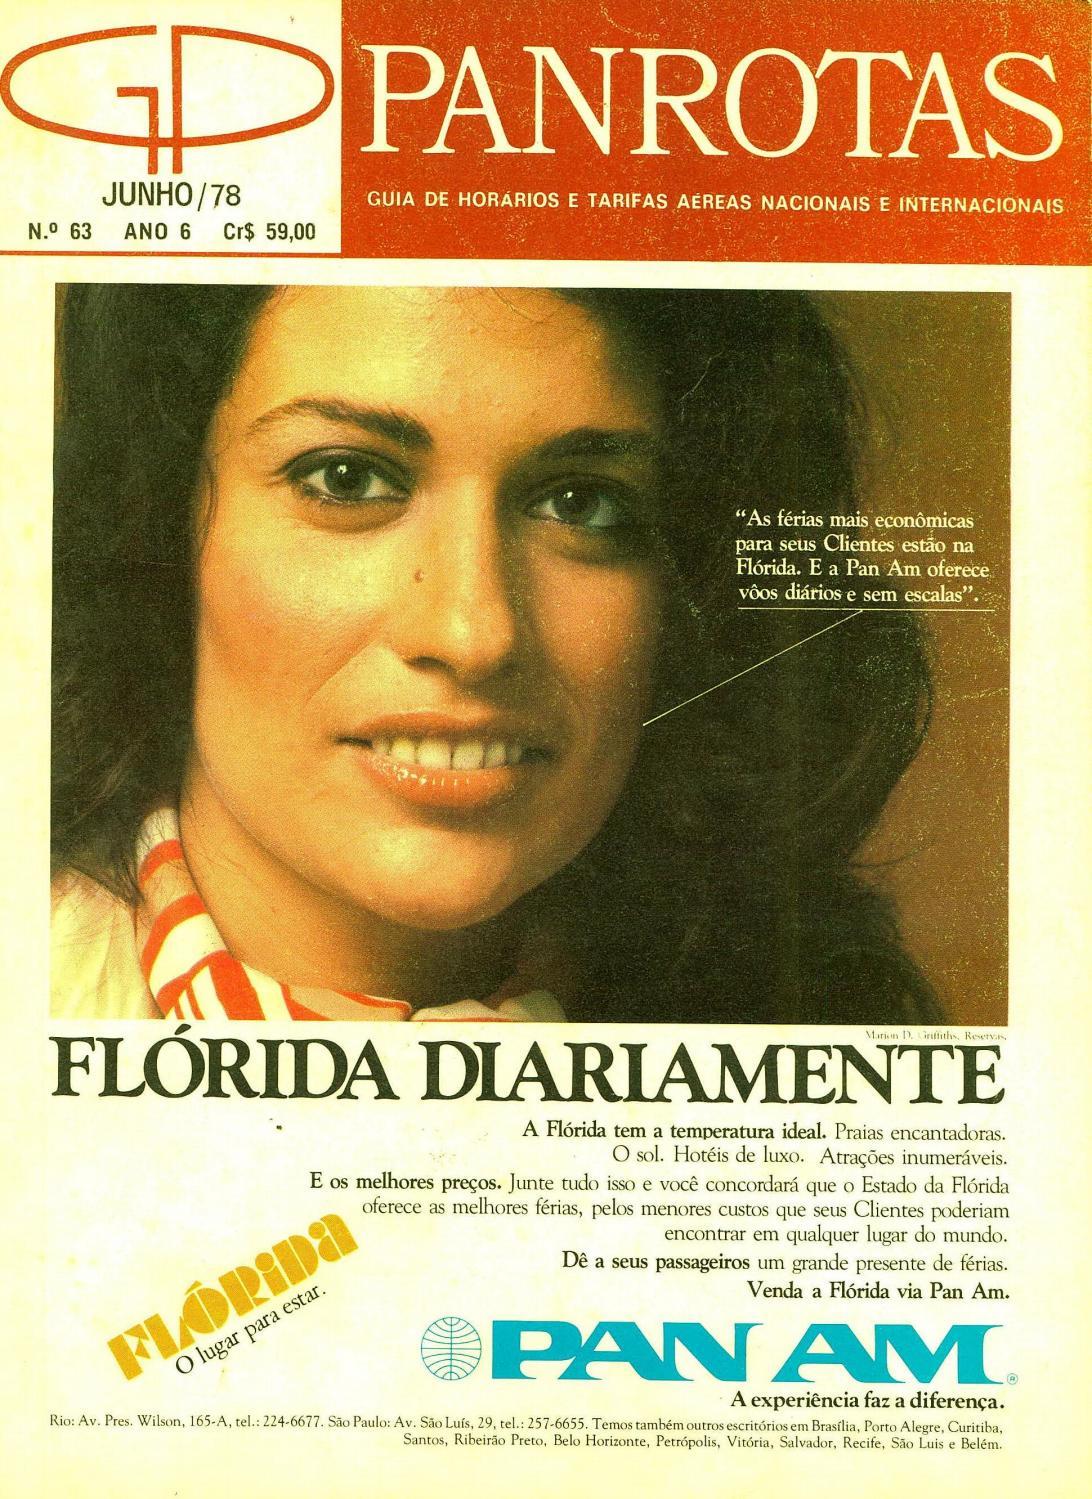 Guia PANROTAS - Edição 63 - Junho 1978 by PANROTAS Editora - issuu d8dff517bdd